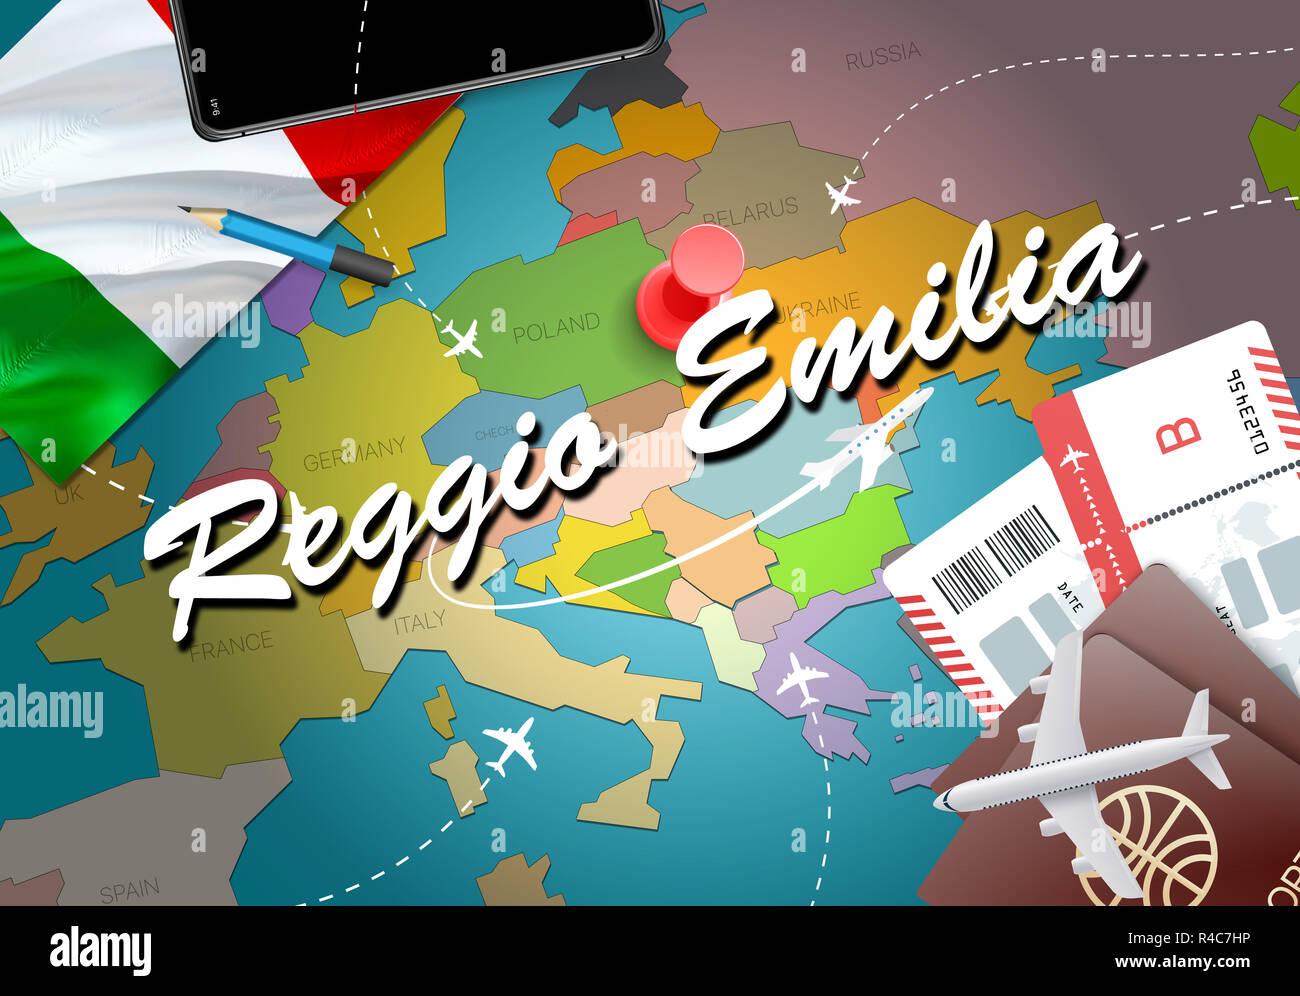 Reggio Emilia City Travel And Tourism Destination Concept Italy